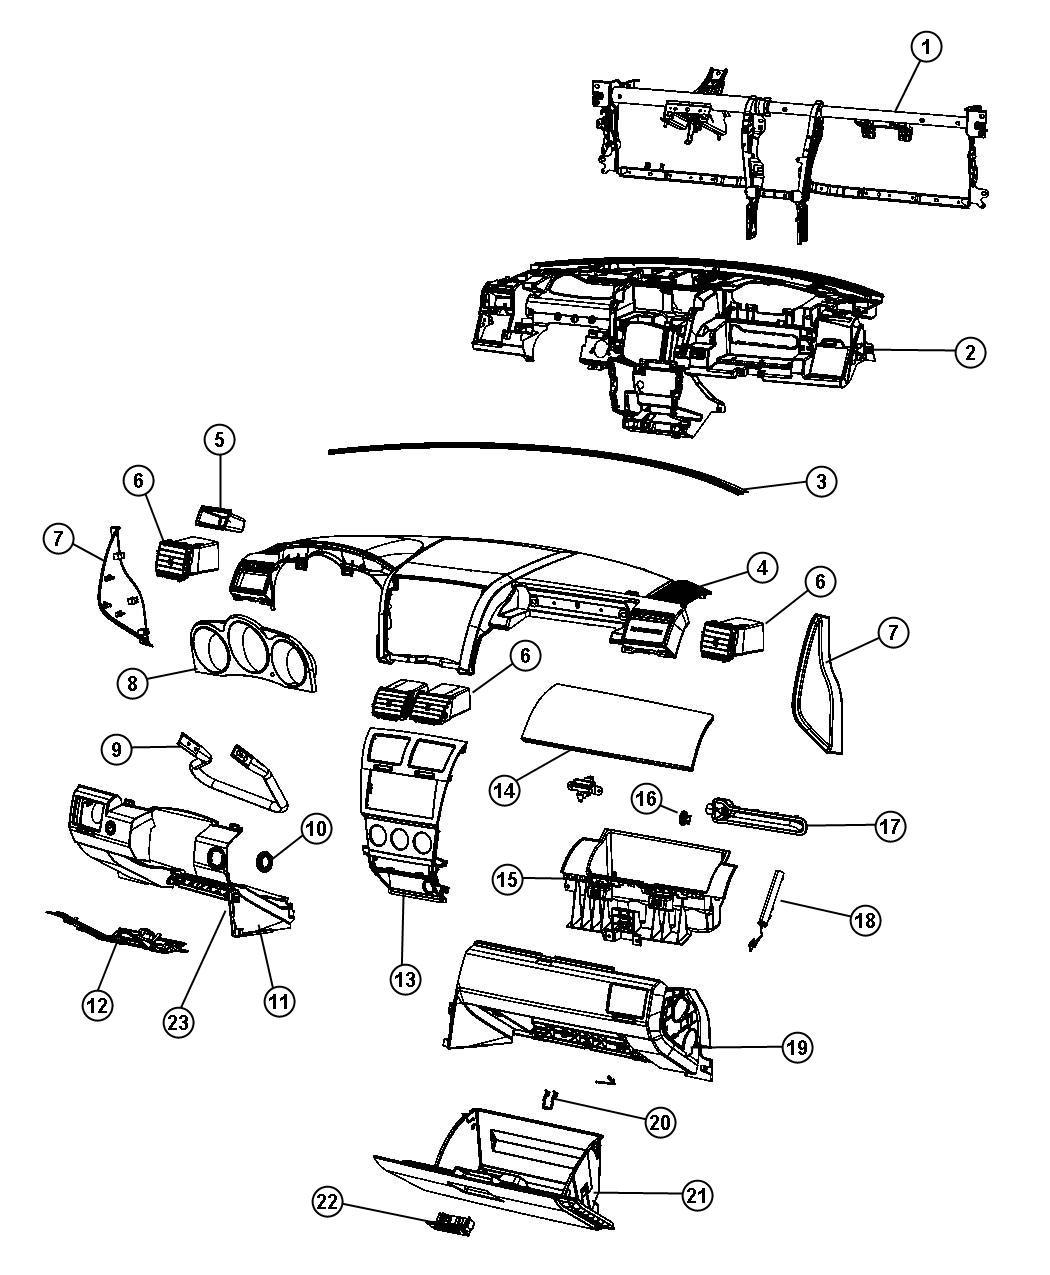 Dodge Avenger Glove box. Instrument panel. [d1], [di], [j1